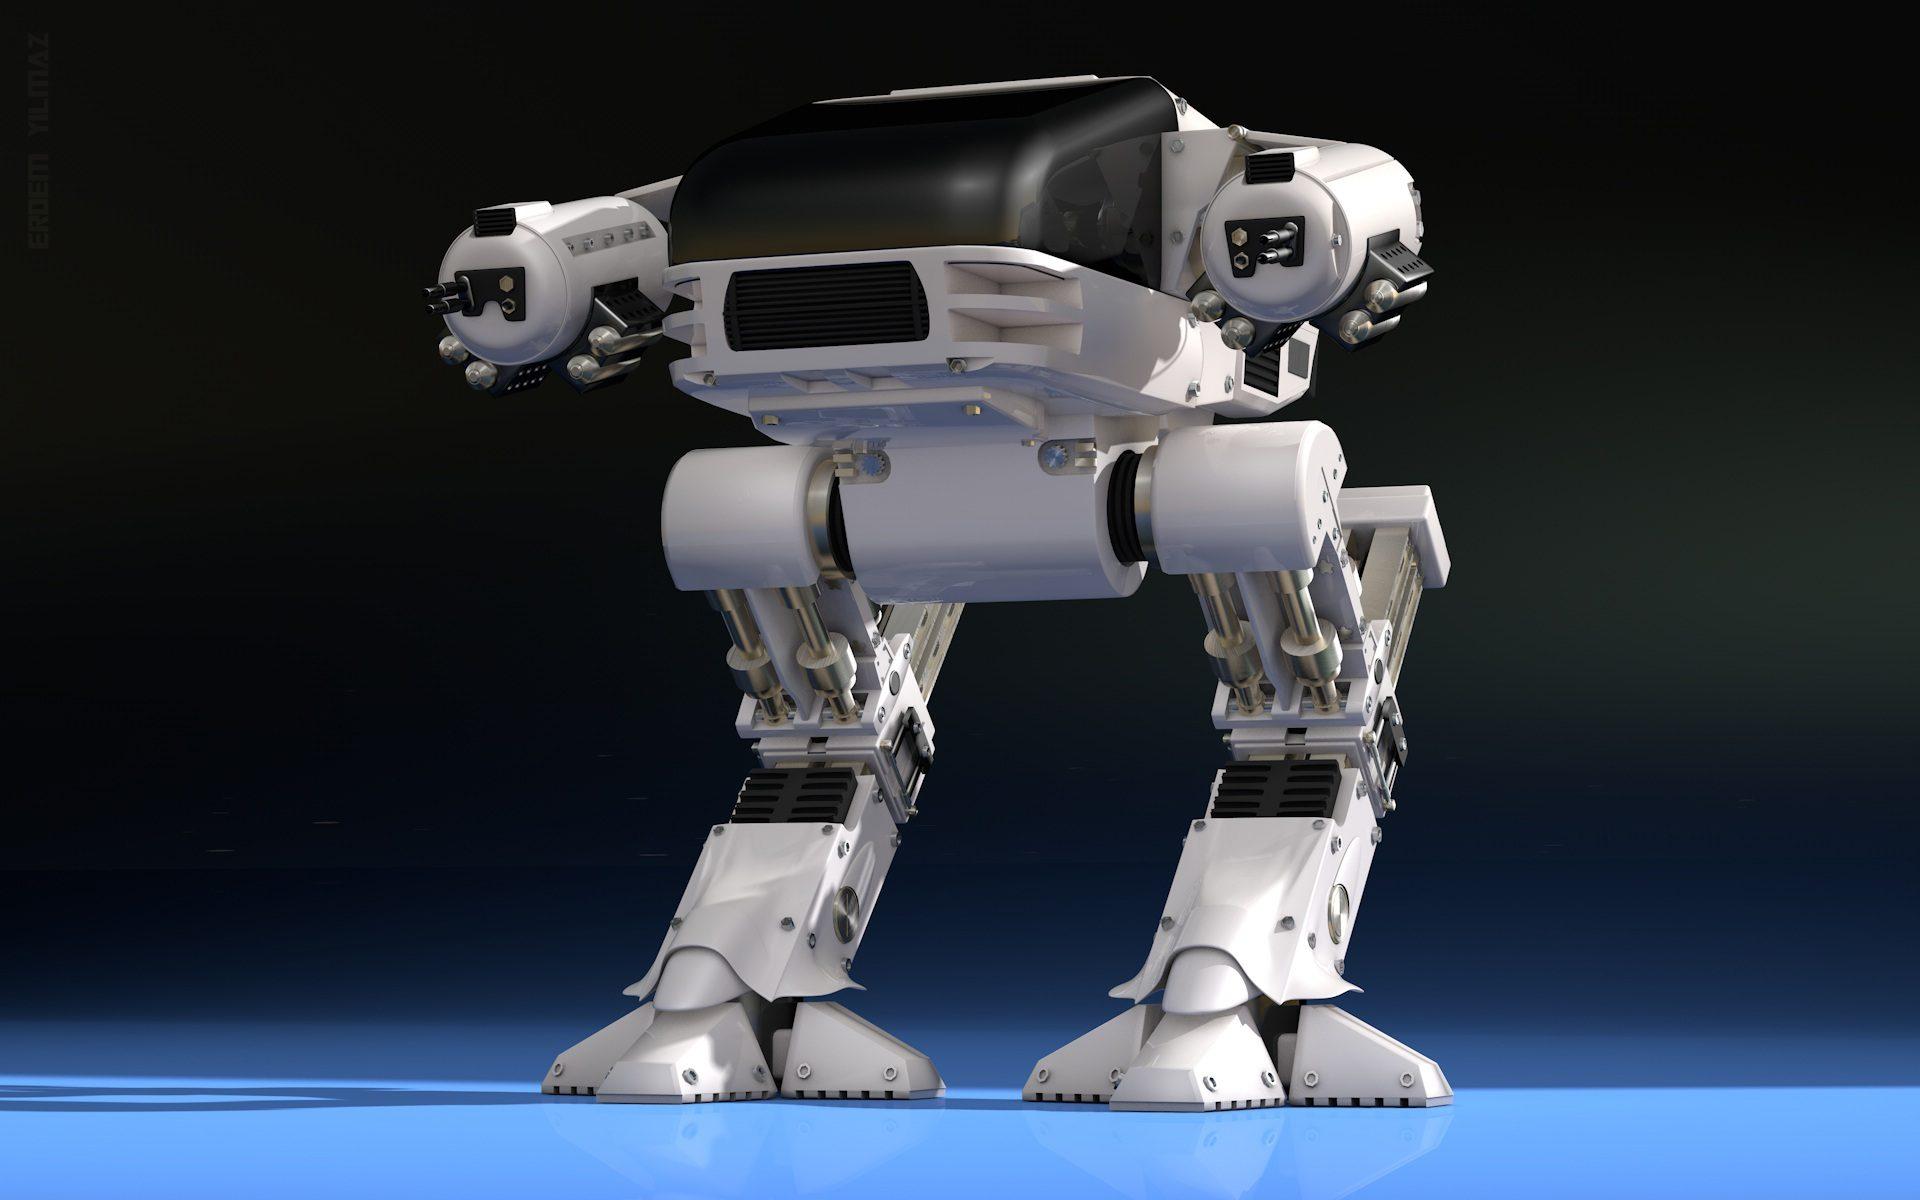 robô, mesh warrior, cyborg, futura, inteligencia artificial - Papéis de parede HD - Professor-falken.com